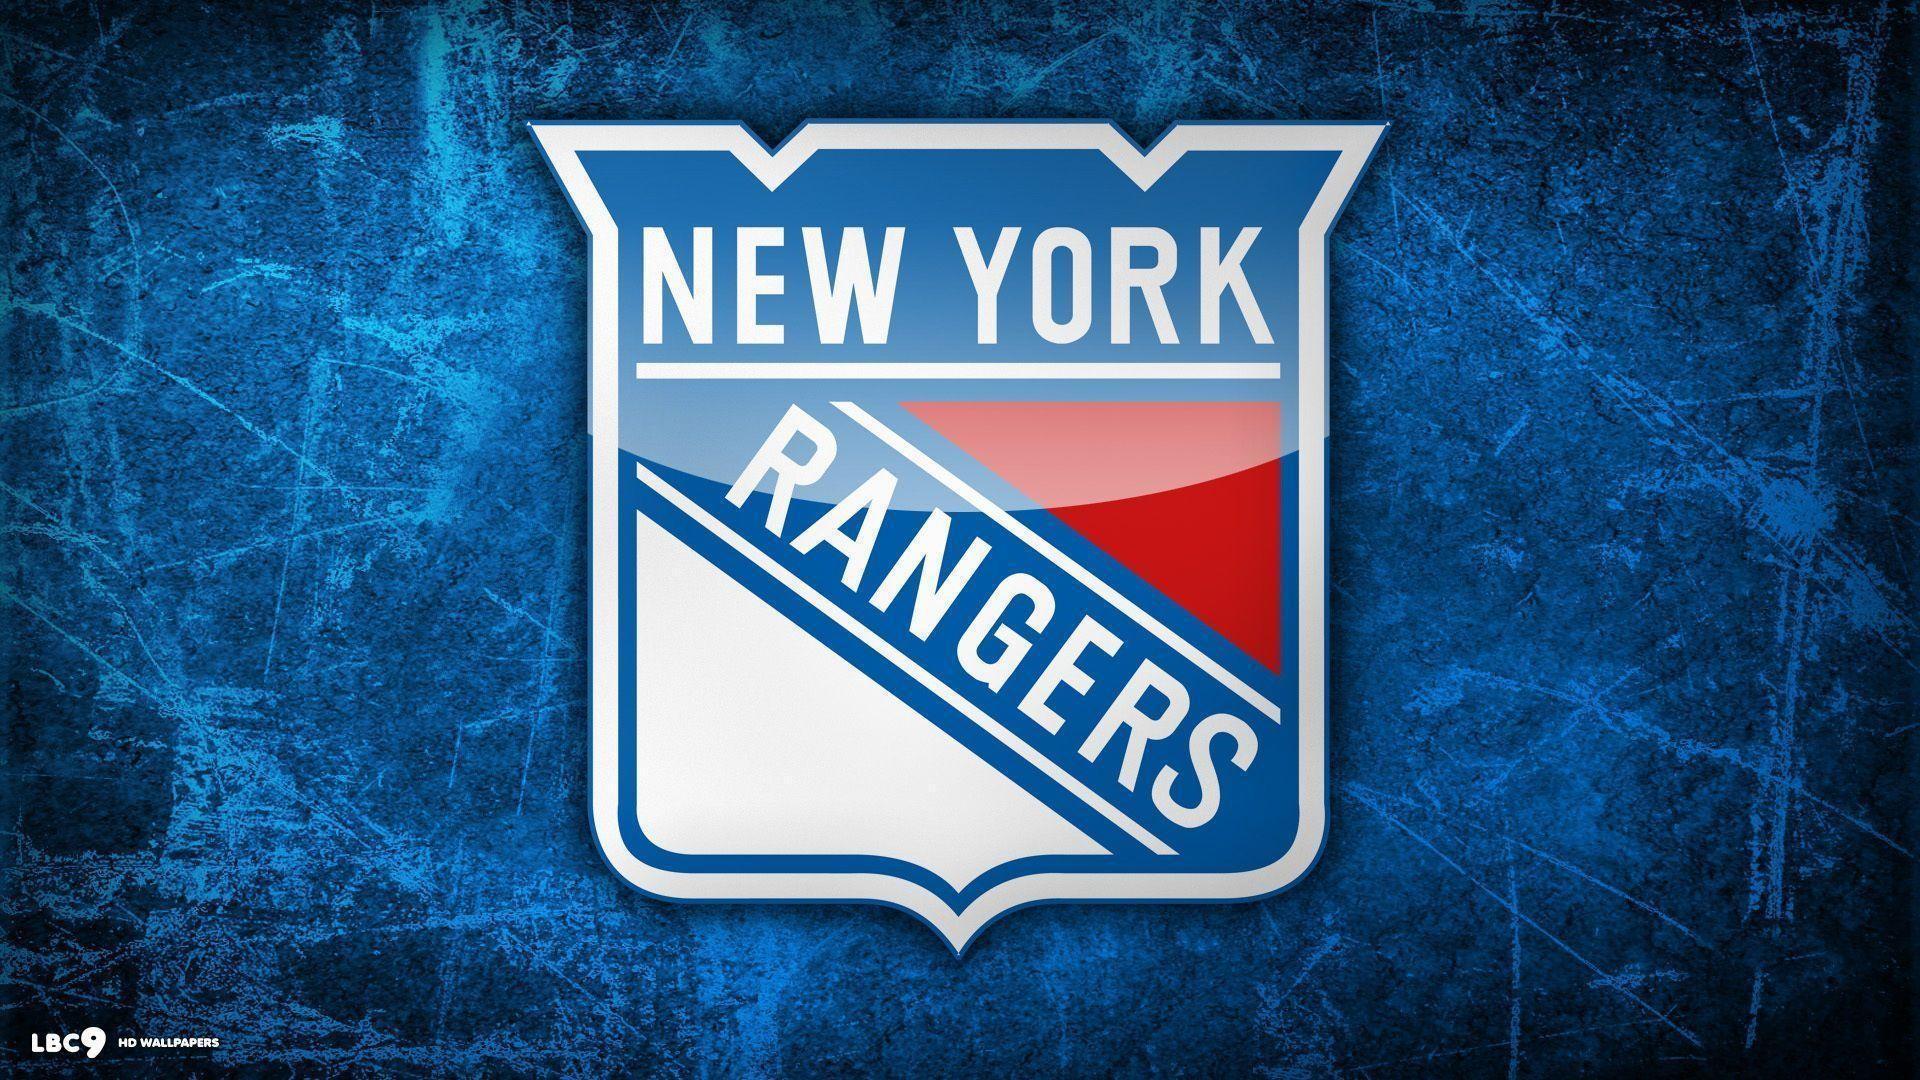 New York Rangers wallpapers   New York Rangers background